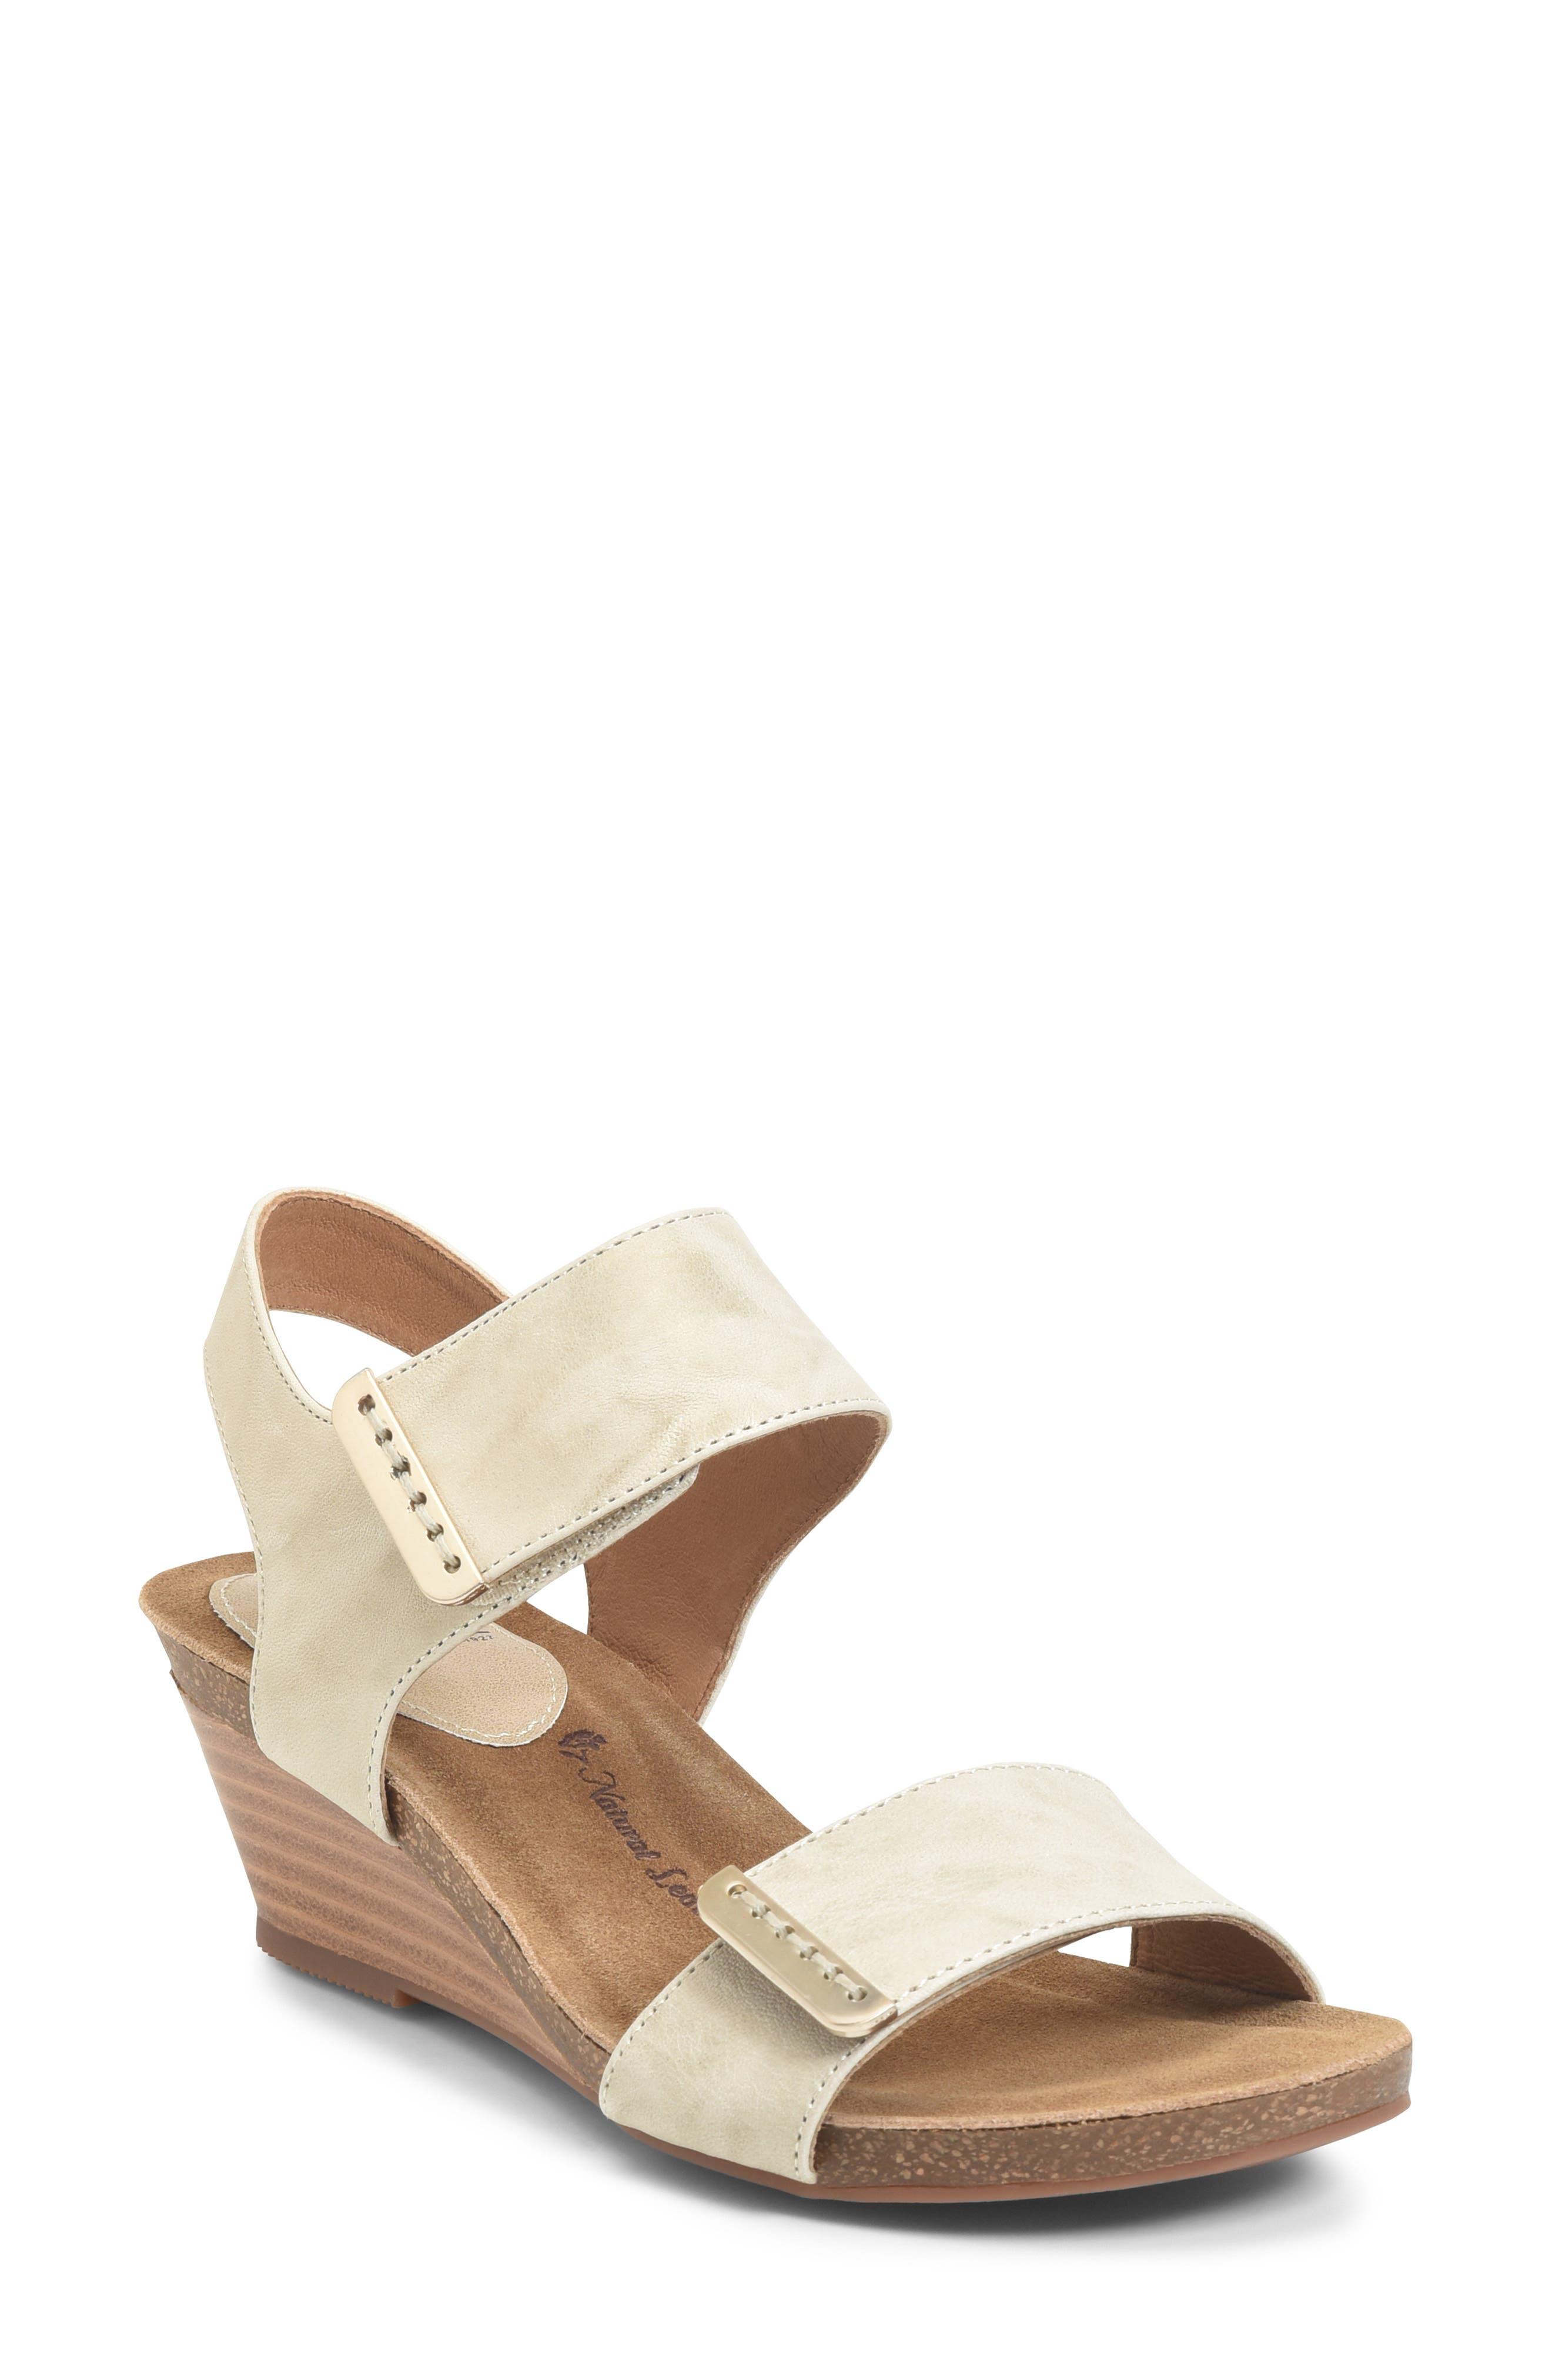 Verdi Wedge Sandal, Main, color, LIGHT GREY LEATHER